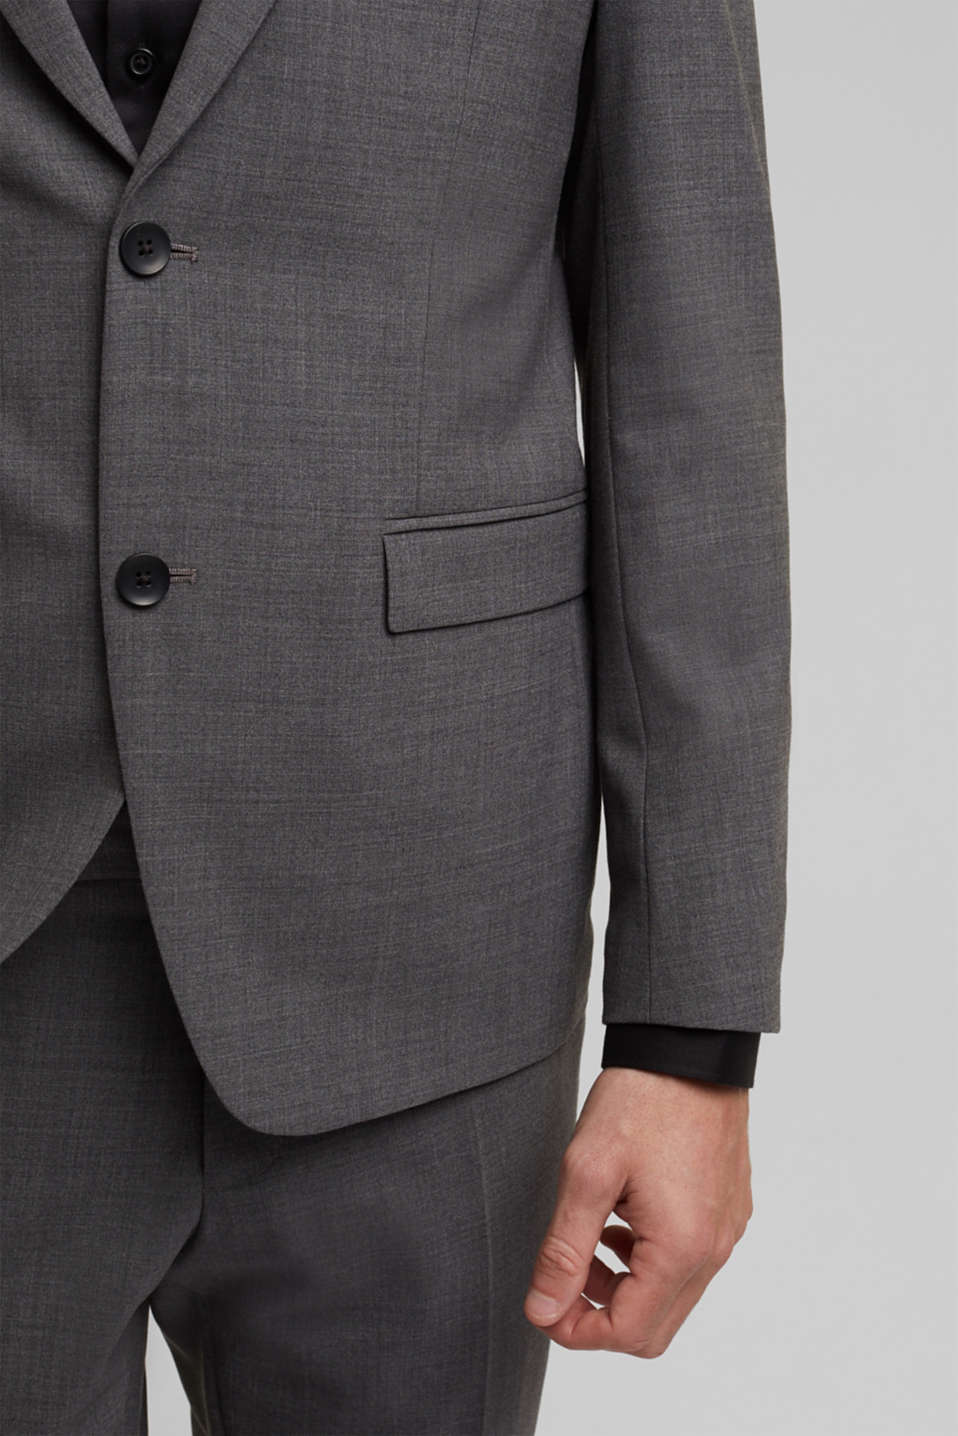 ACTIVE SUIT tailored jacket, wool blend, DARK GREY 5, detail image number 2